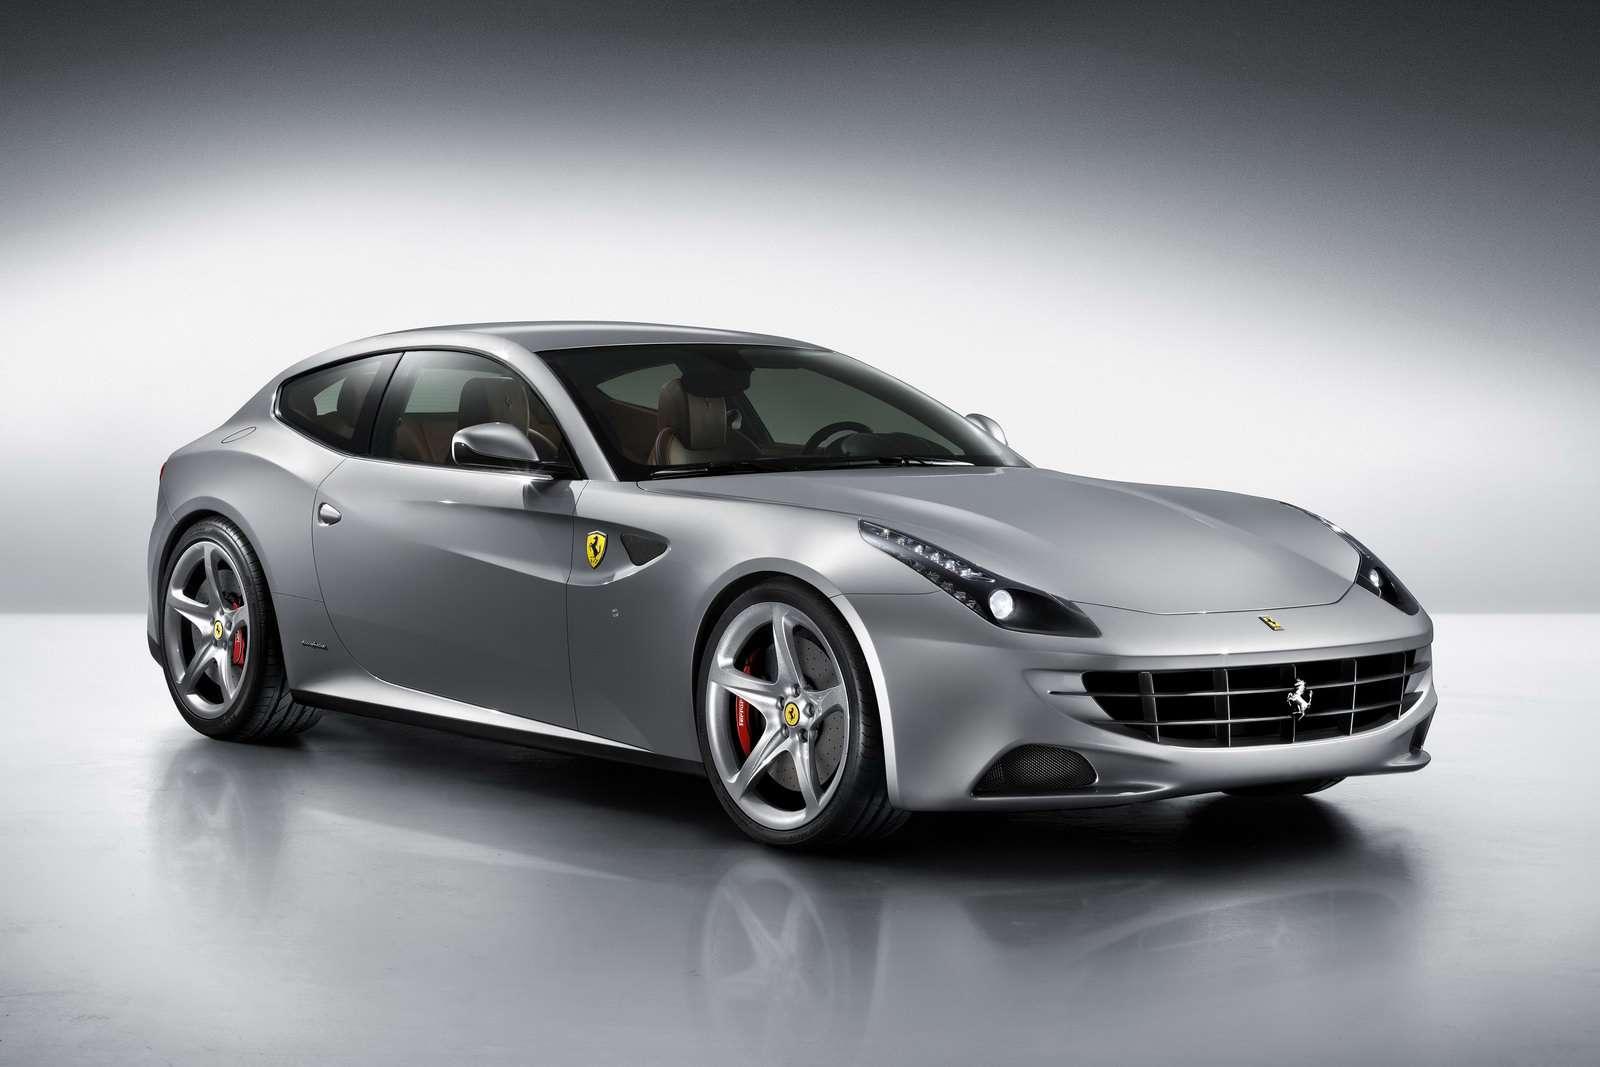 Ferrari FF szary fot styczen 2011